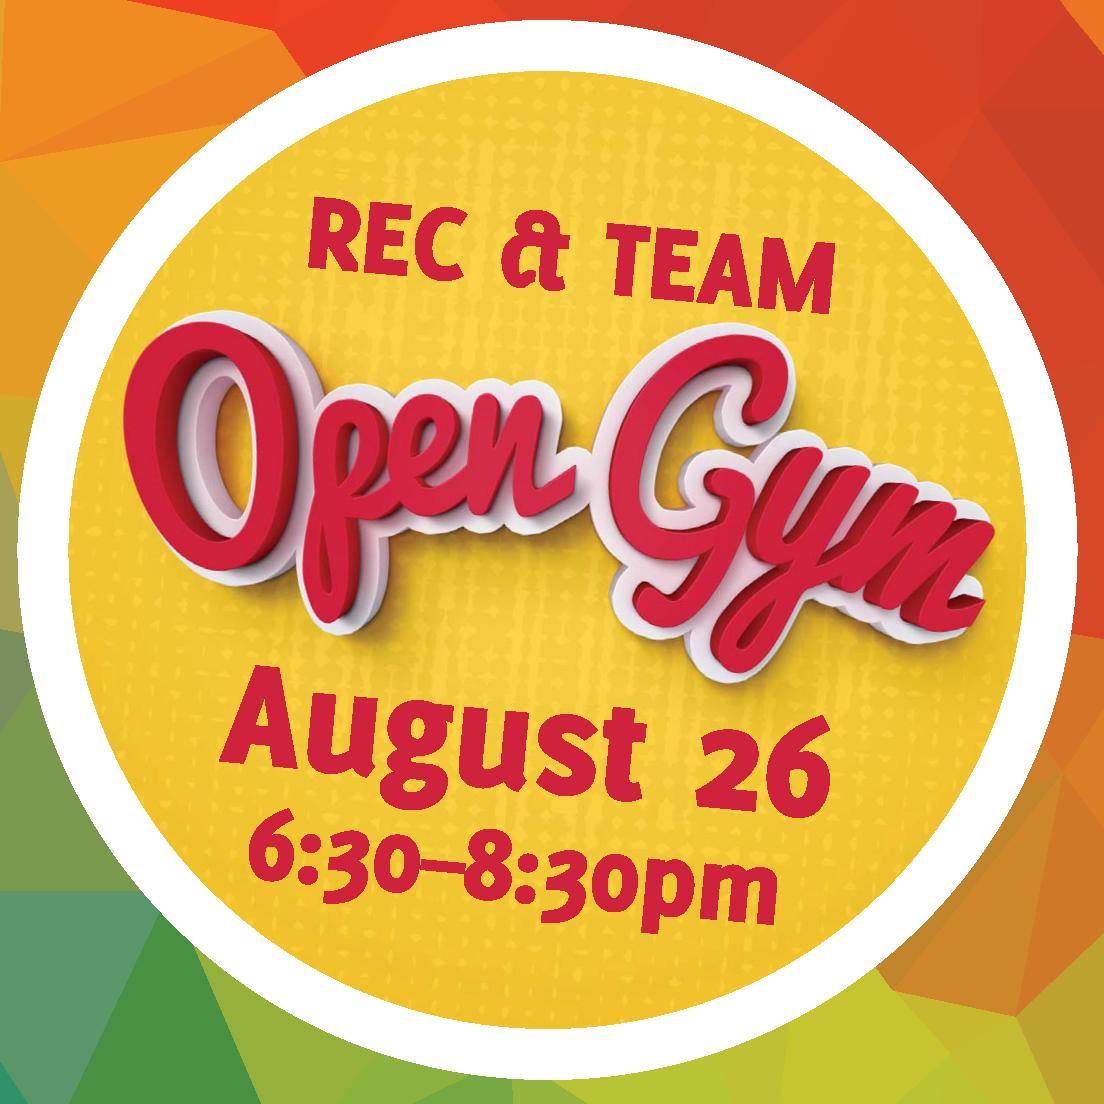 Open Gym Web 8 17